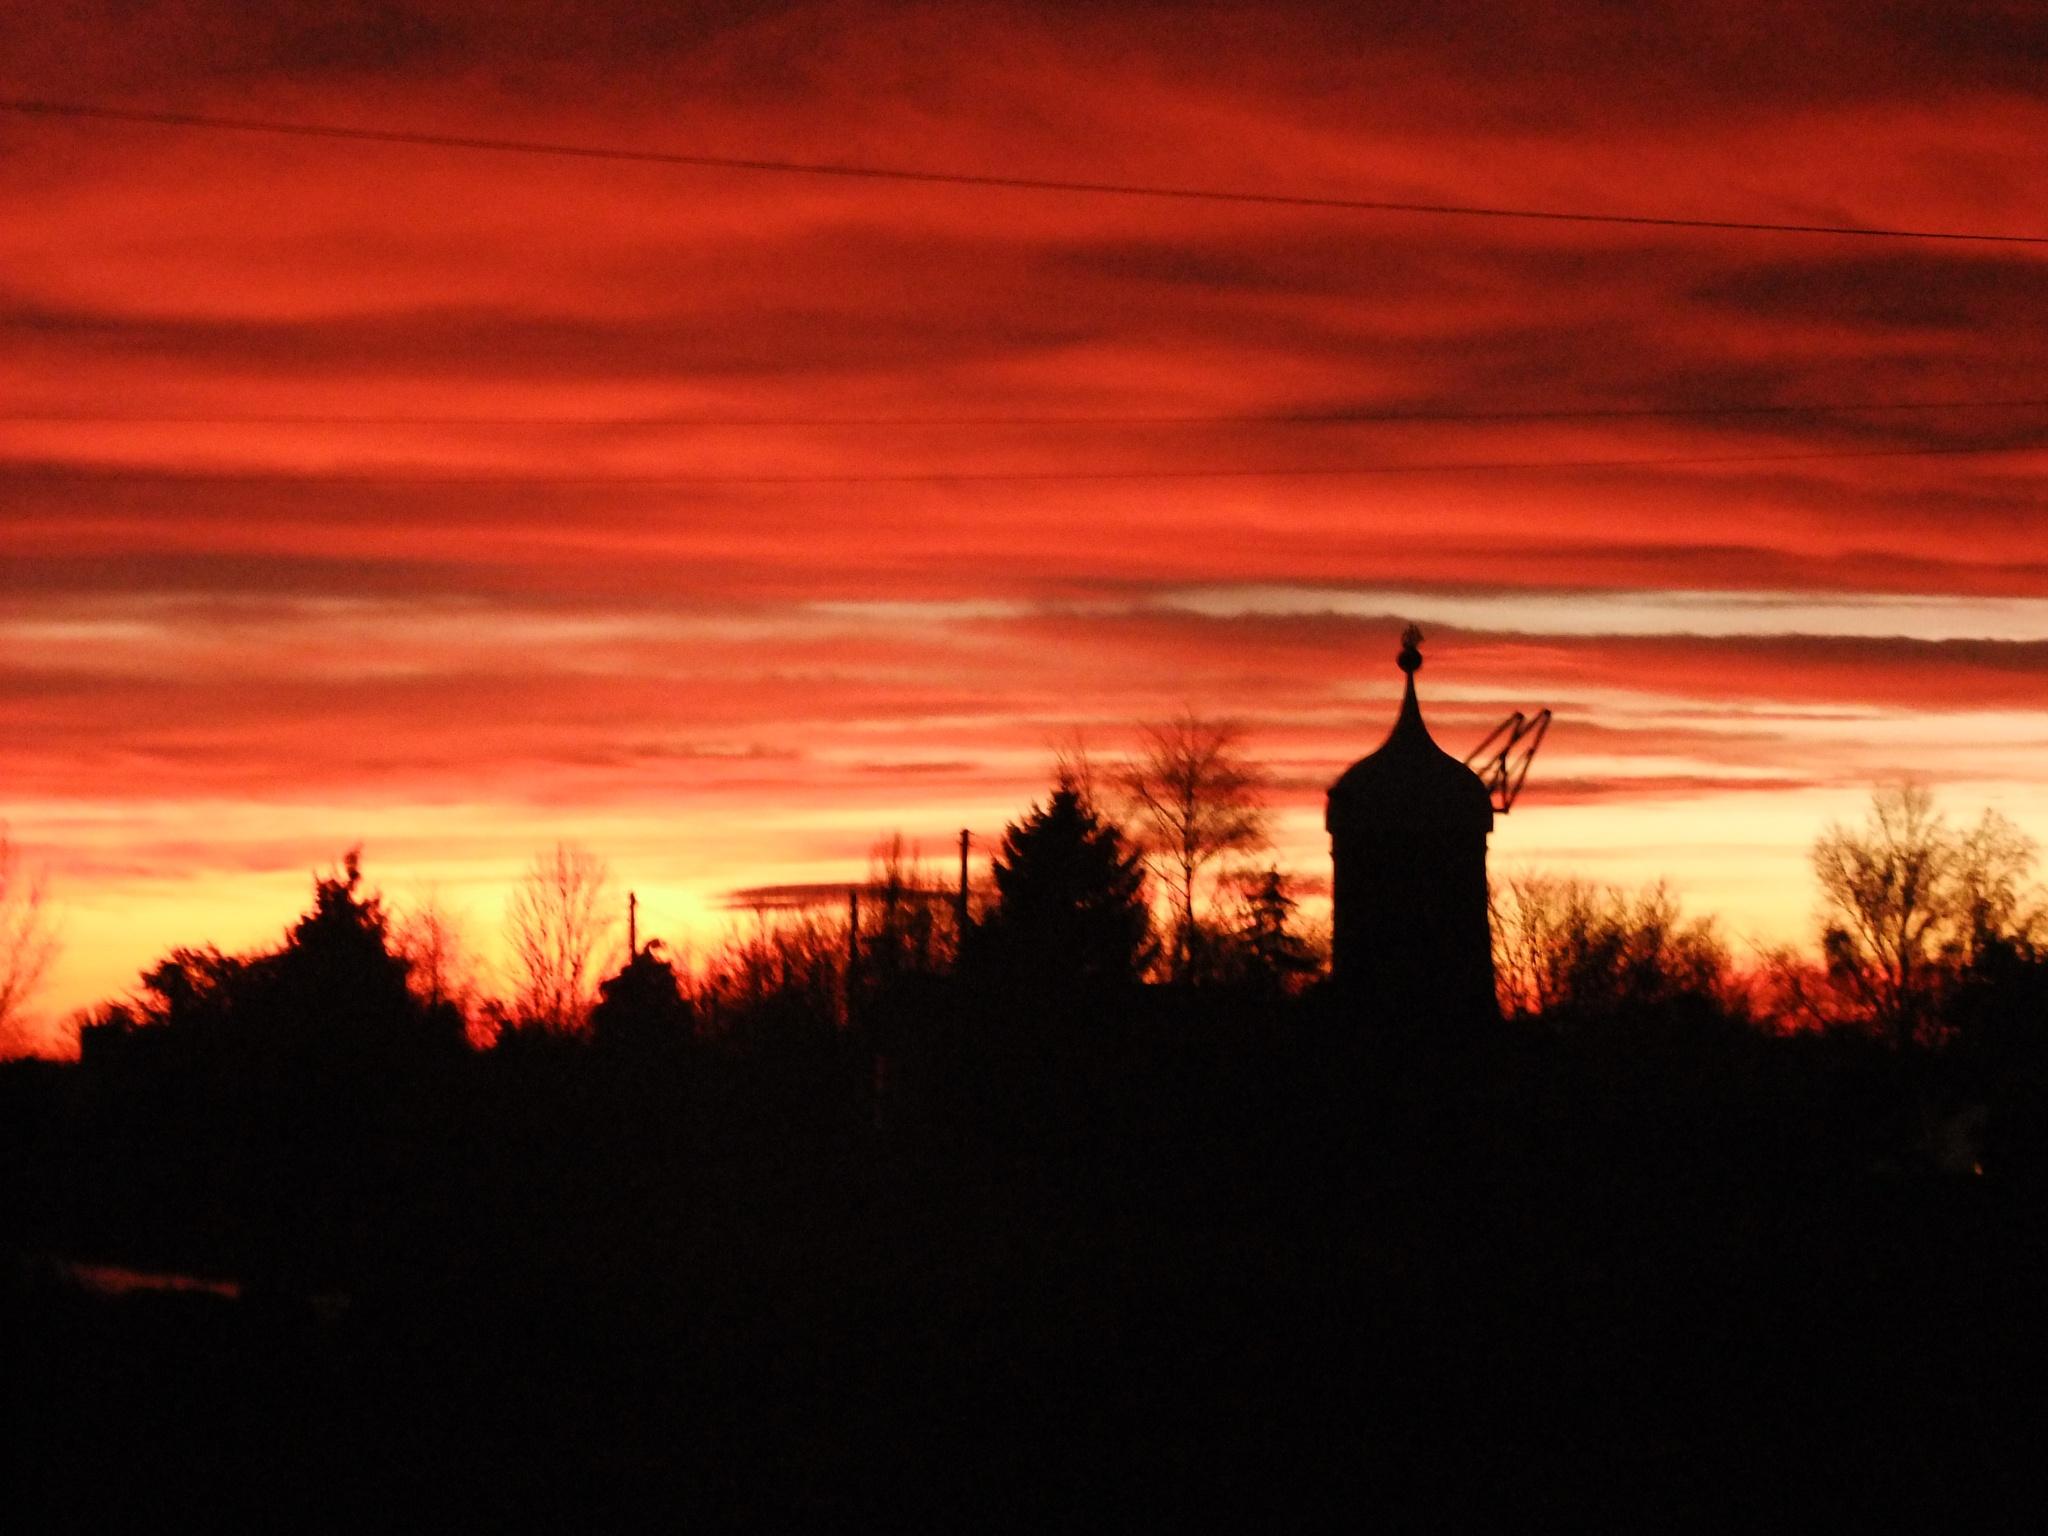 The Mill at Sunset by Charlotte Kehlan Kebbell